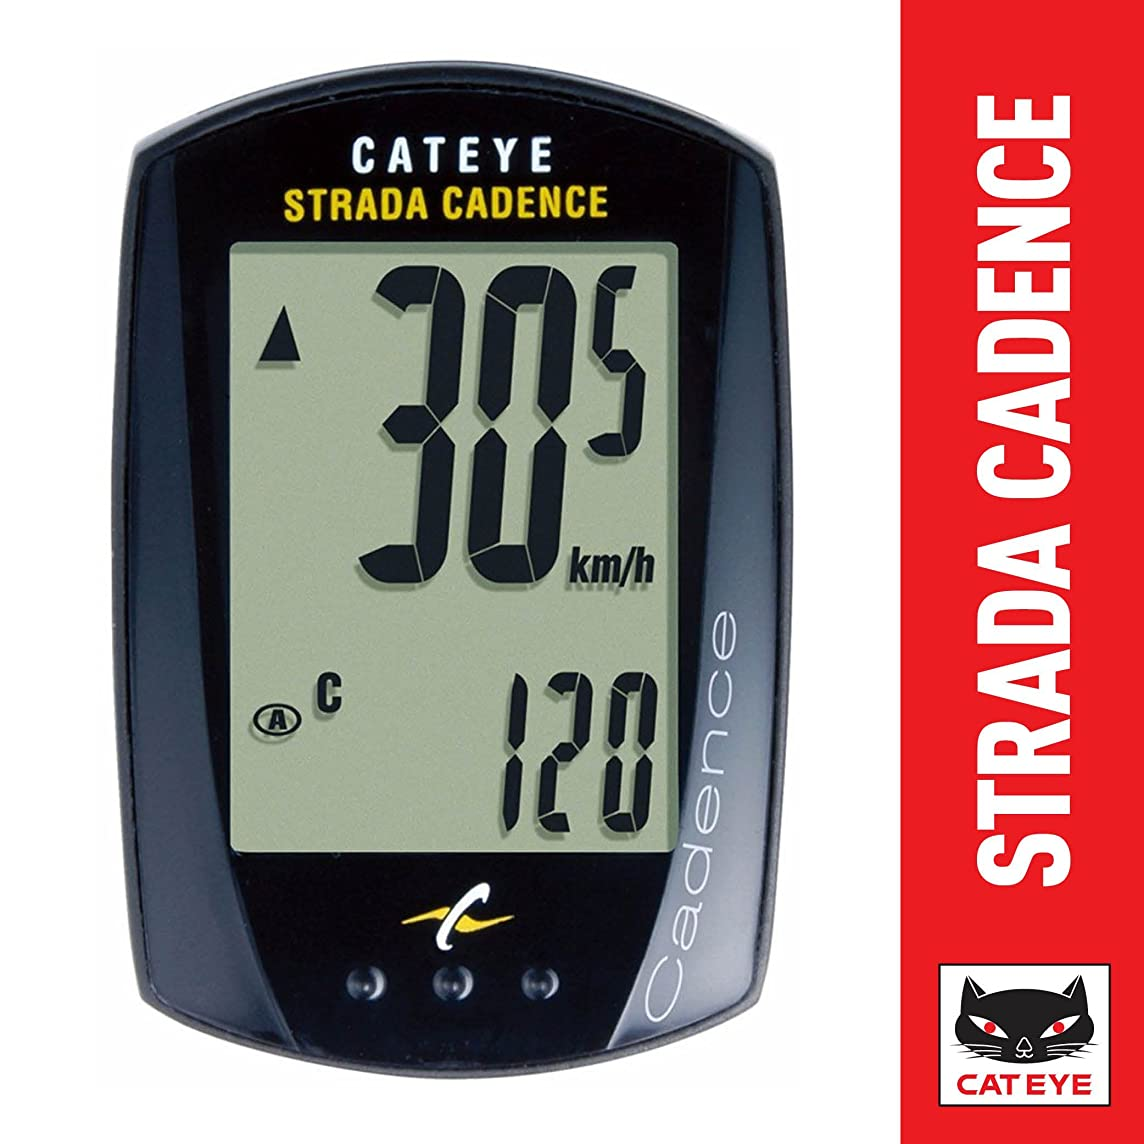 CatEye Black Strada Cadence Wired Road Bike Computer